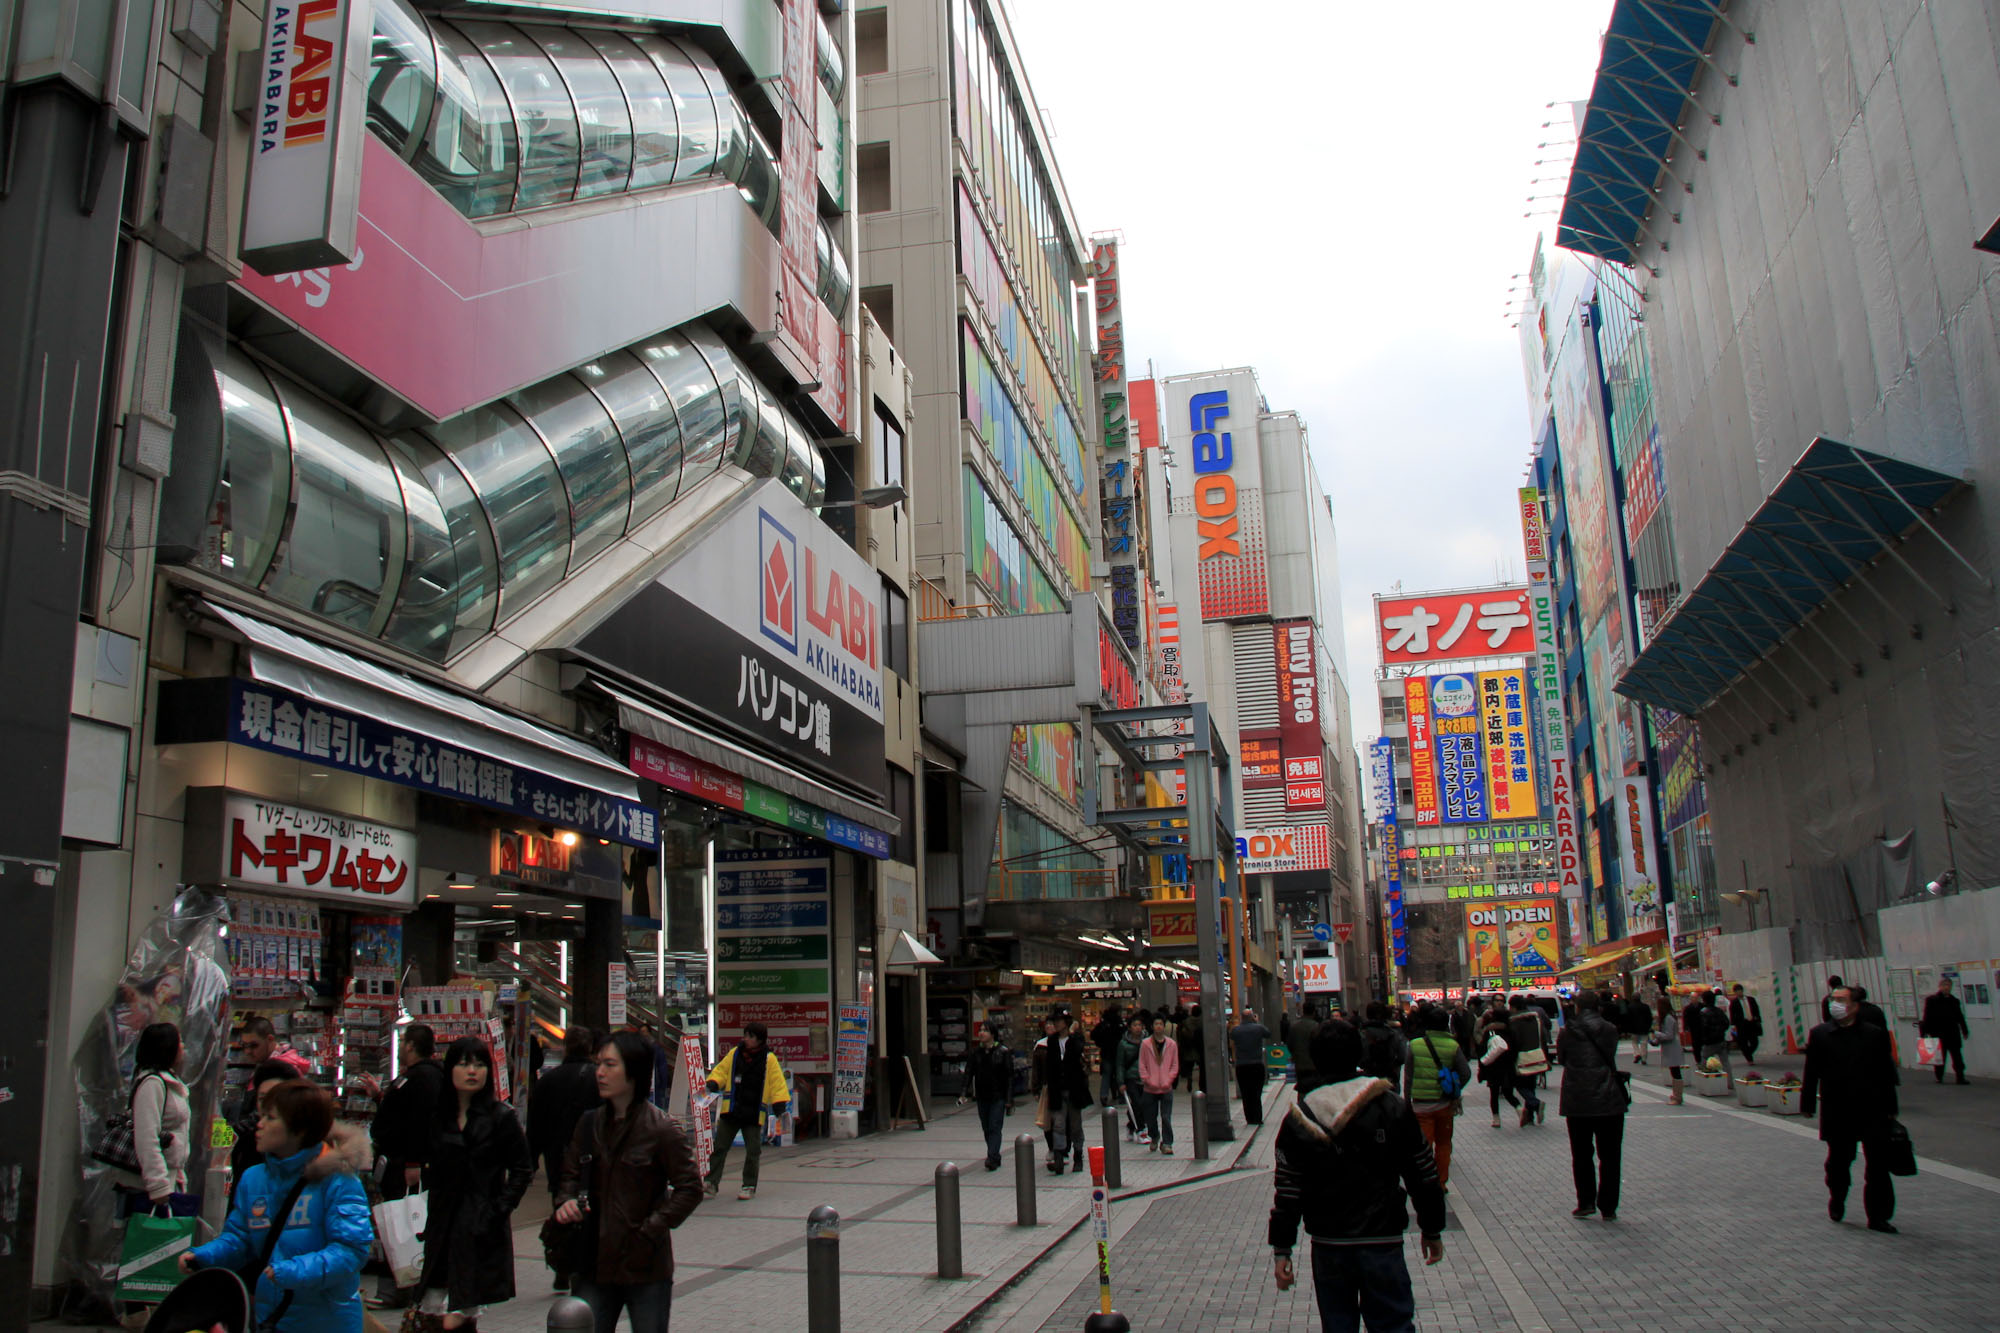 akihabara la ville lectrique pour geeks et otaku de tokyo. Black Bedroom Furniture Sets. Home Design Ideas